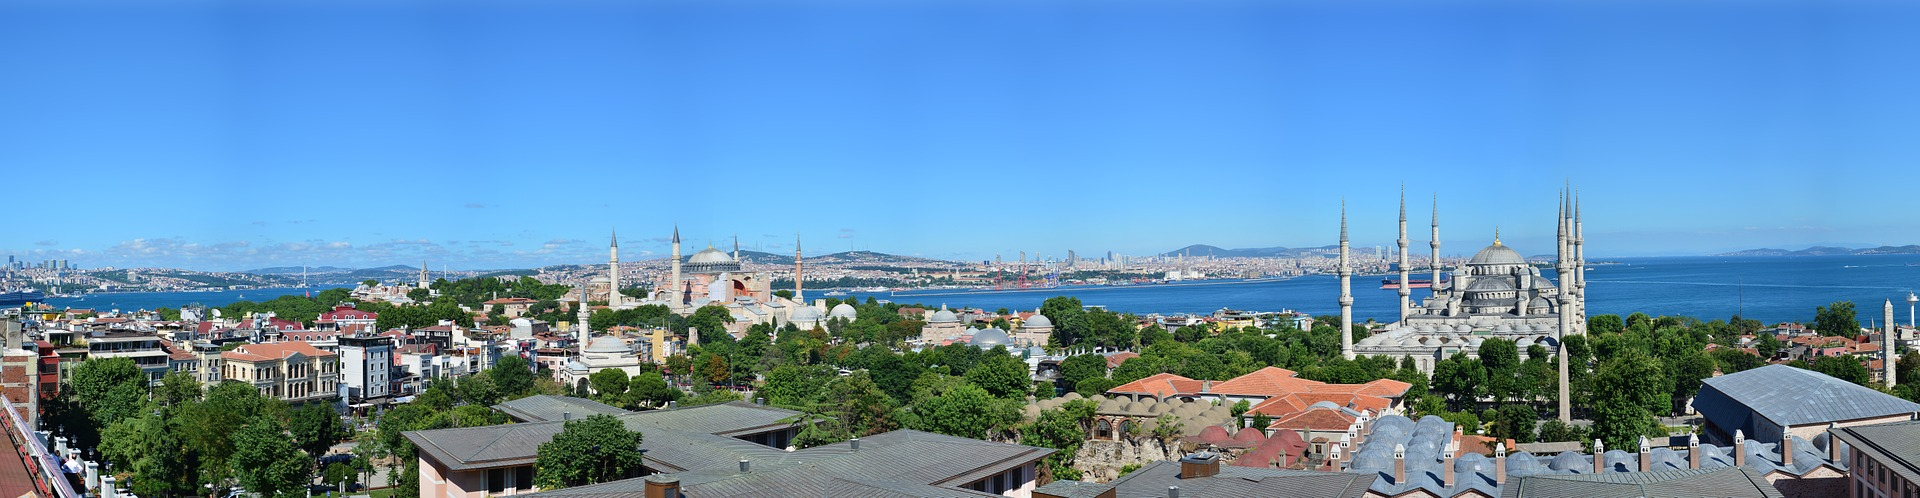 https://cestovnakancelariadaka.sk/files/product/istanbul-1261194_1920.jpg